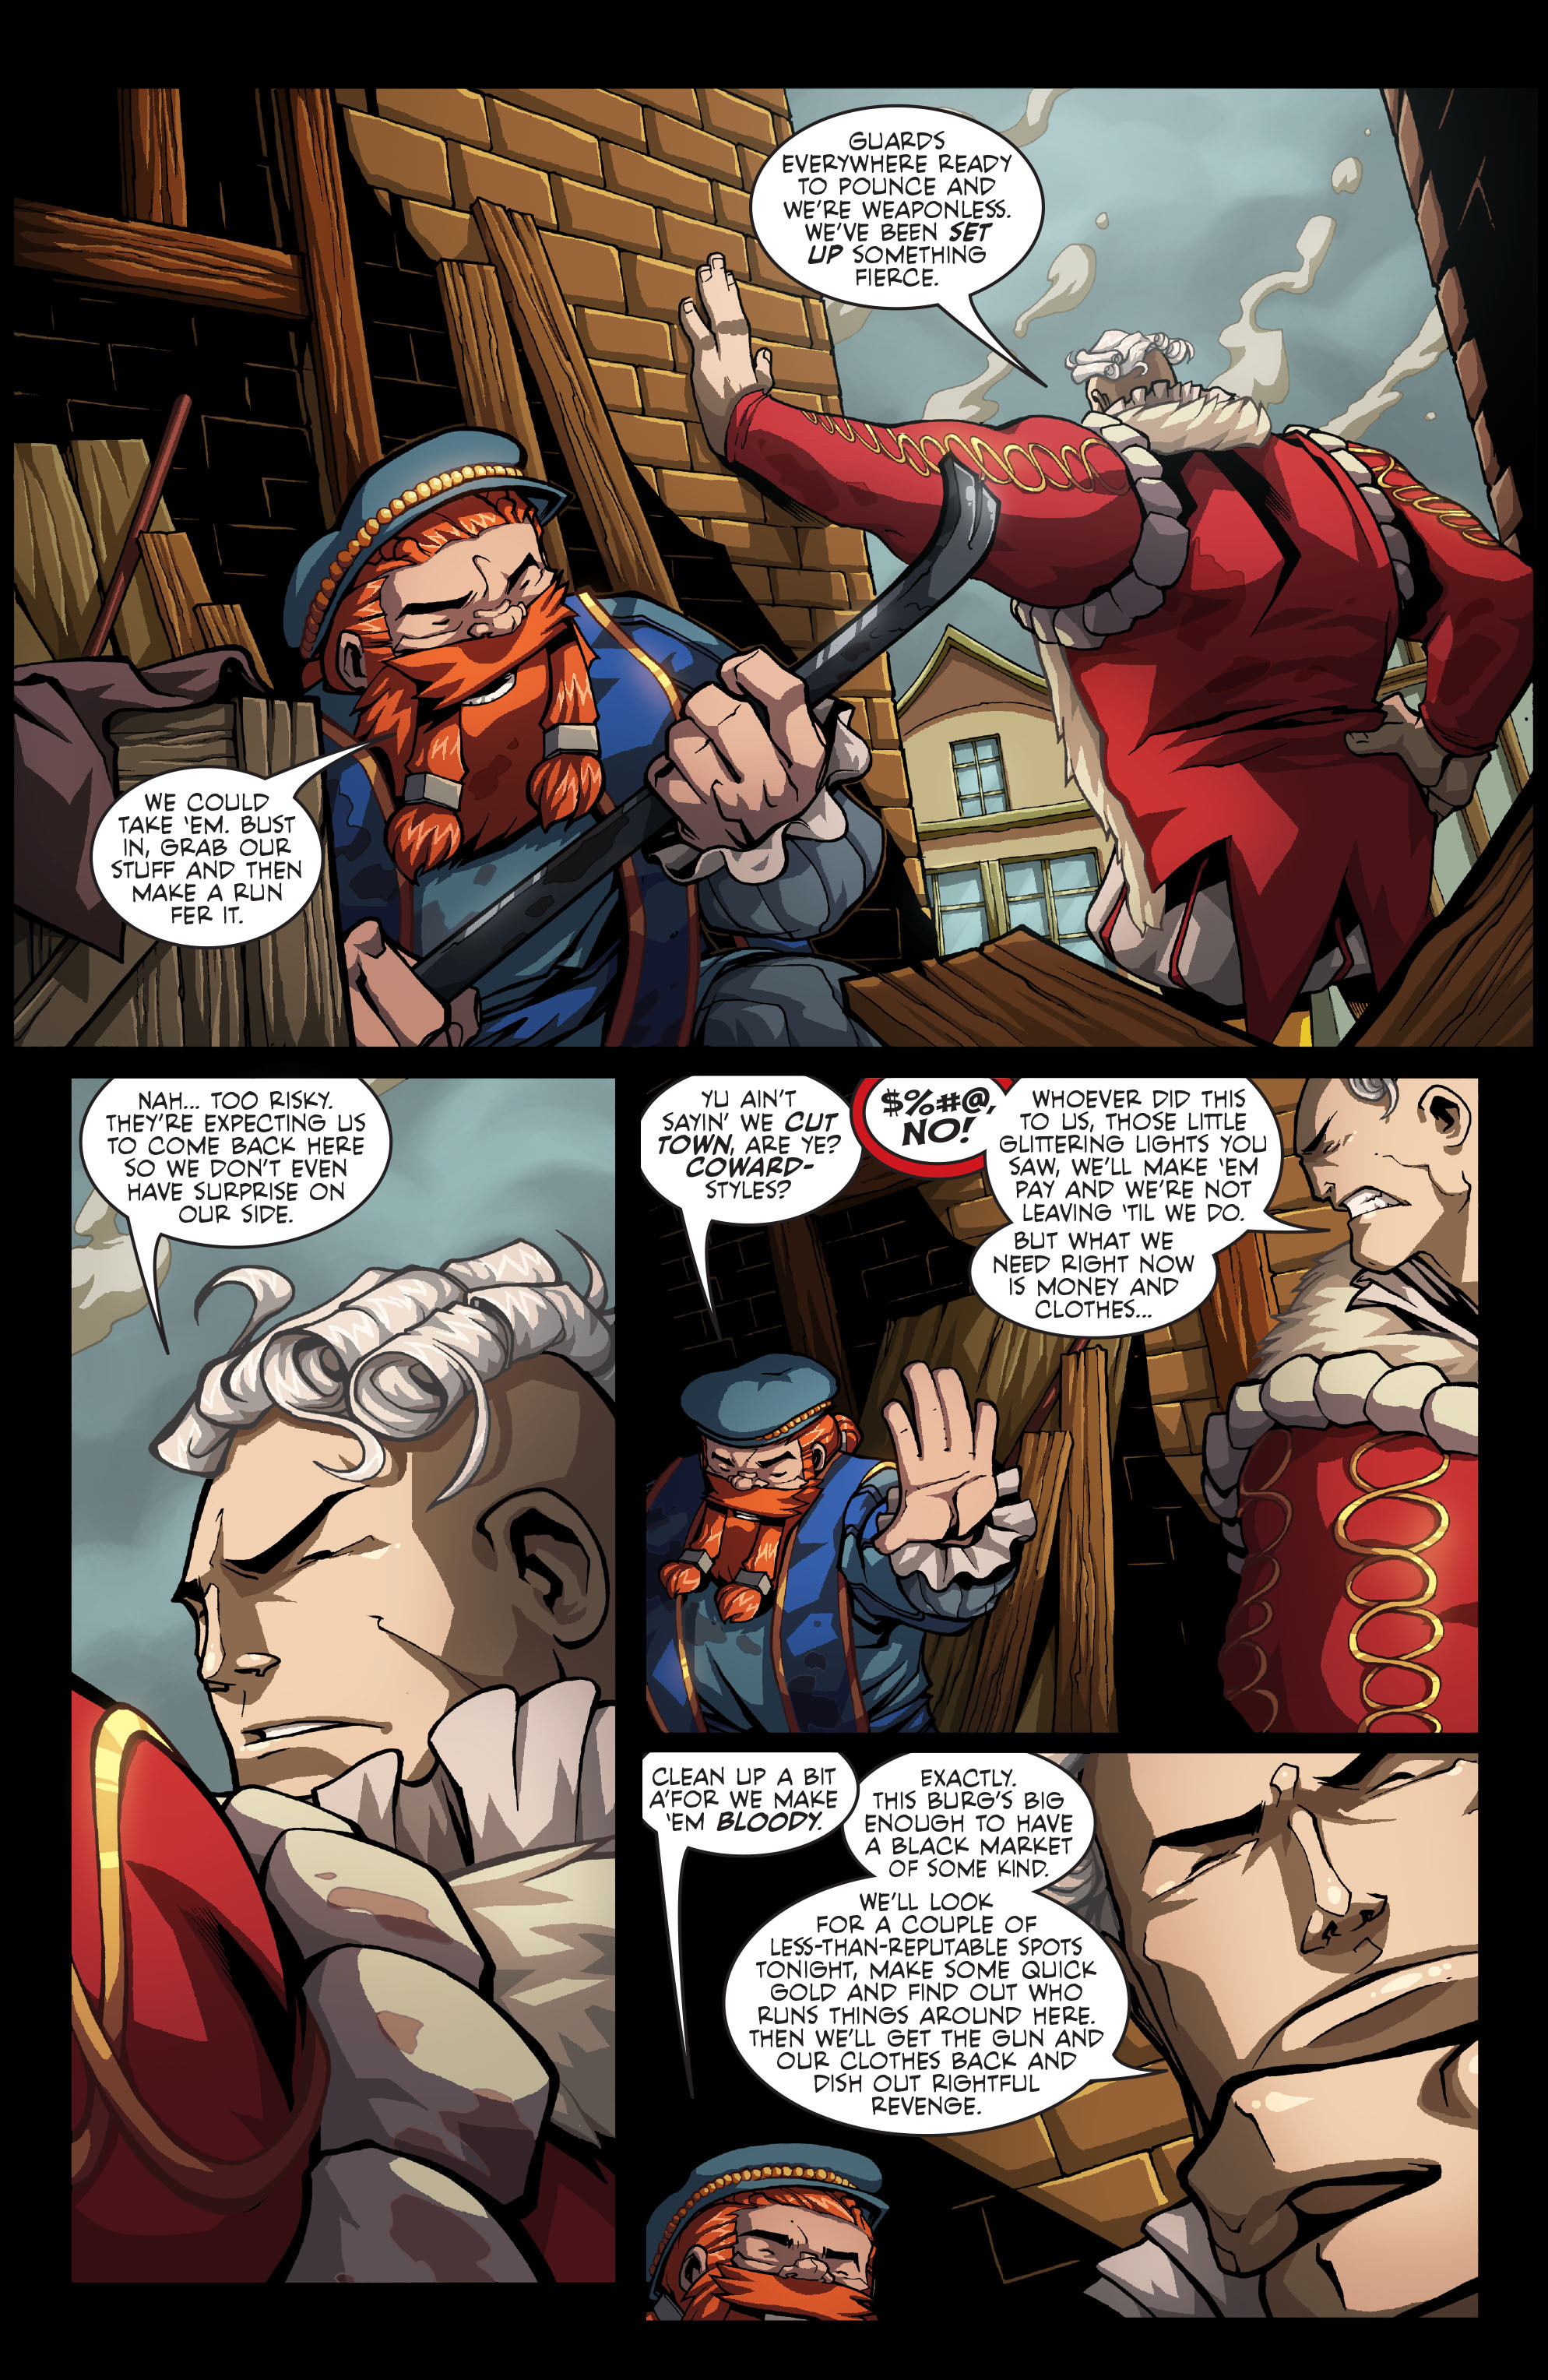 Read online Skullkickers comic -  Issue #8 - 6